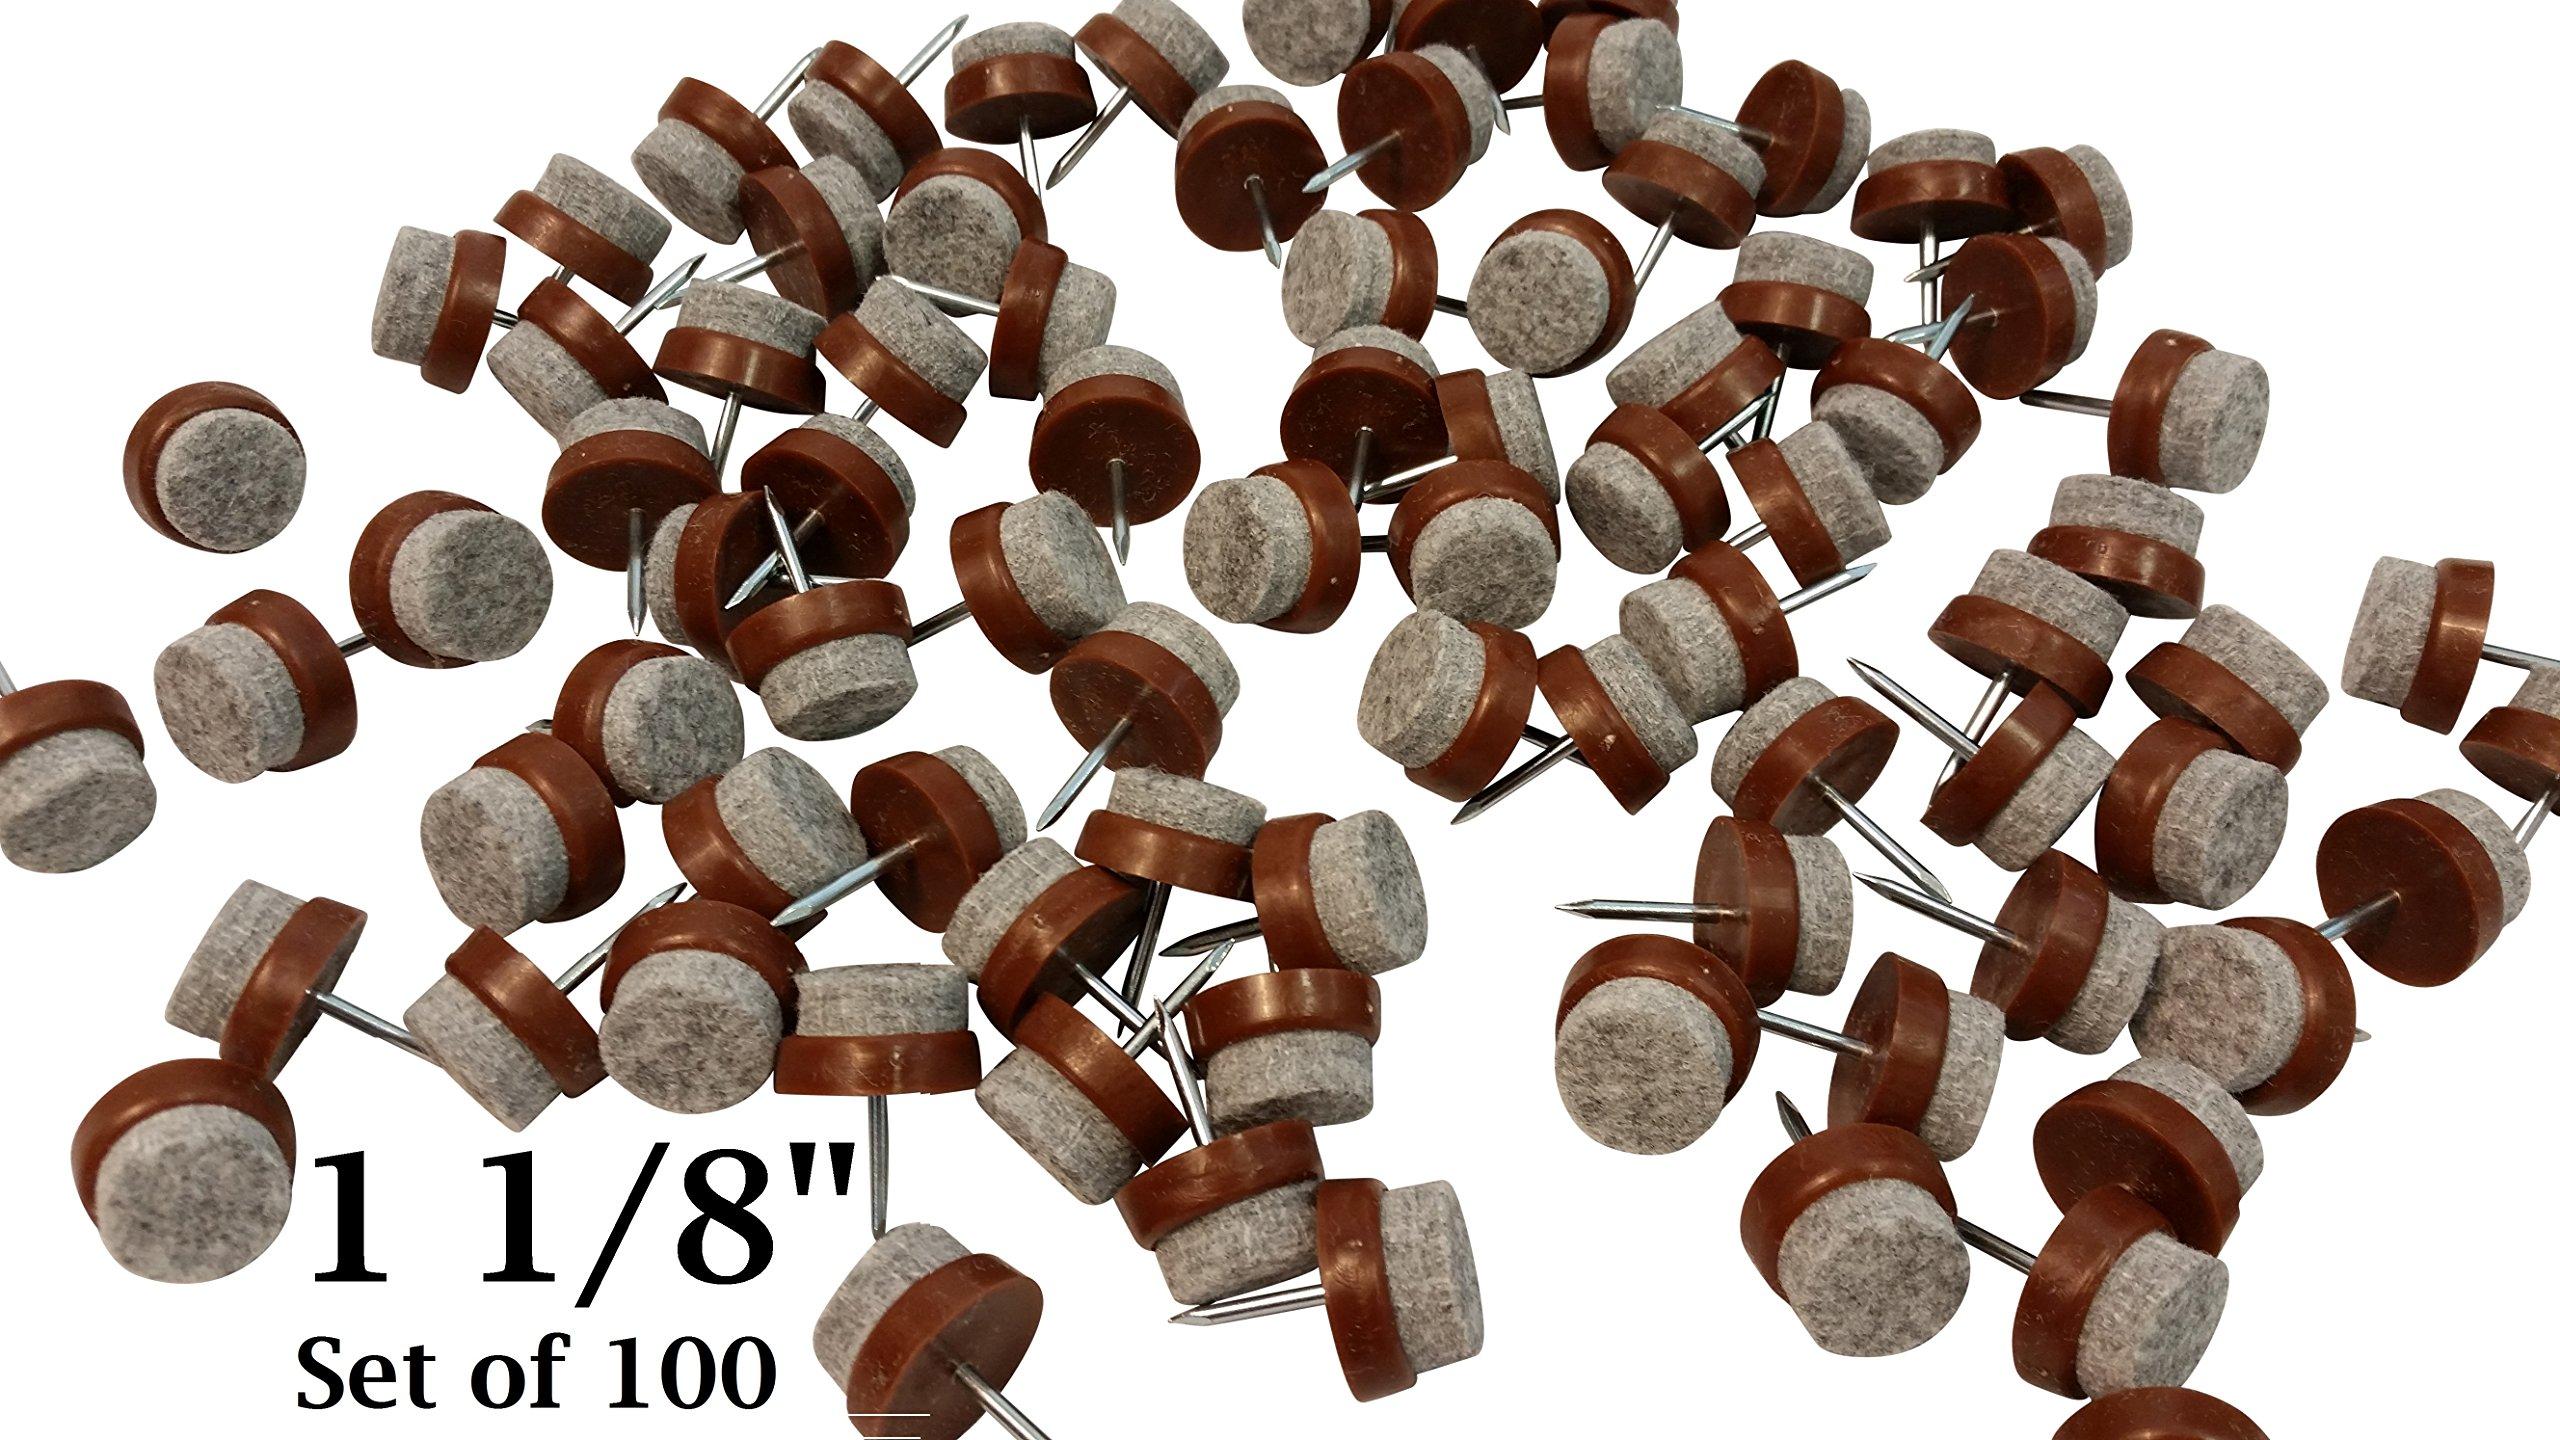 Felt Bottom Nail-On Chair Glides Protect Tile & Hardwood Floors 1 1/8'' - Set of 100